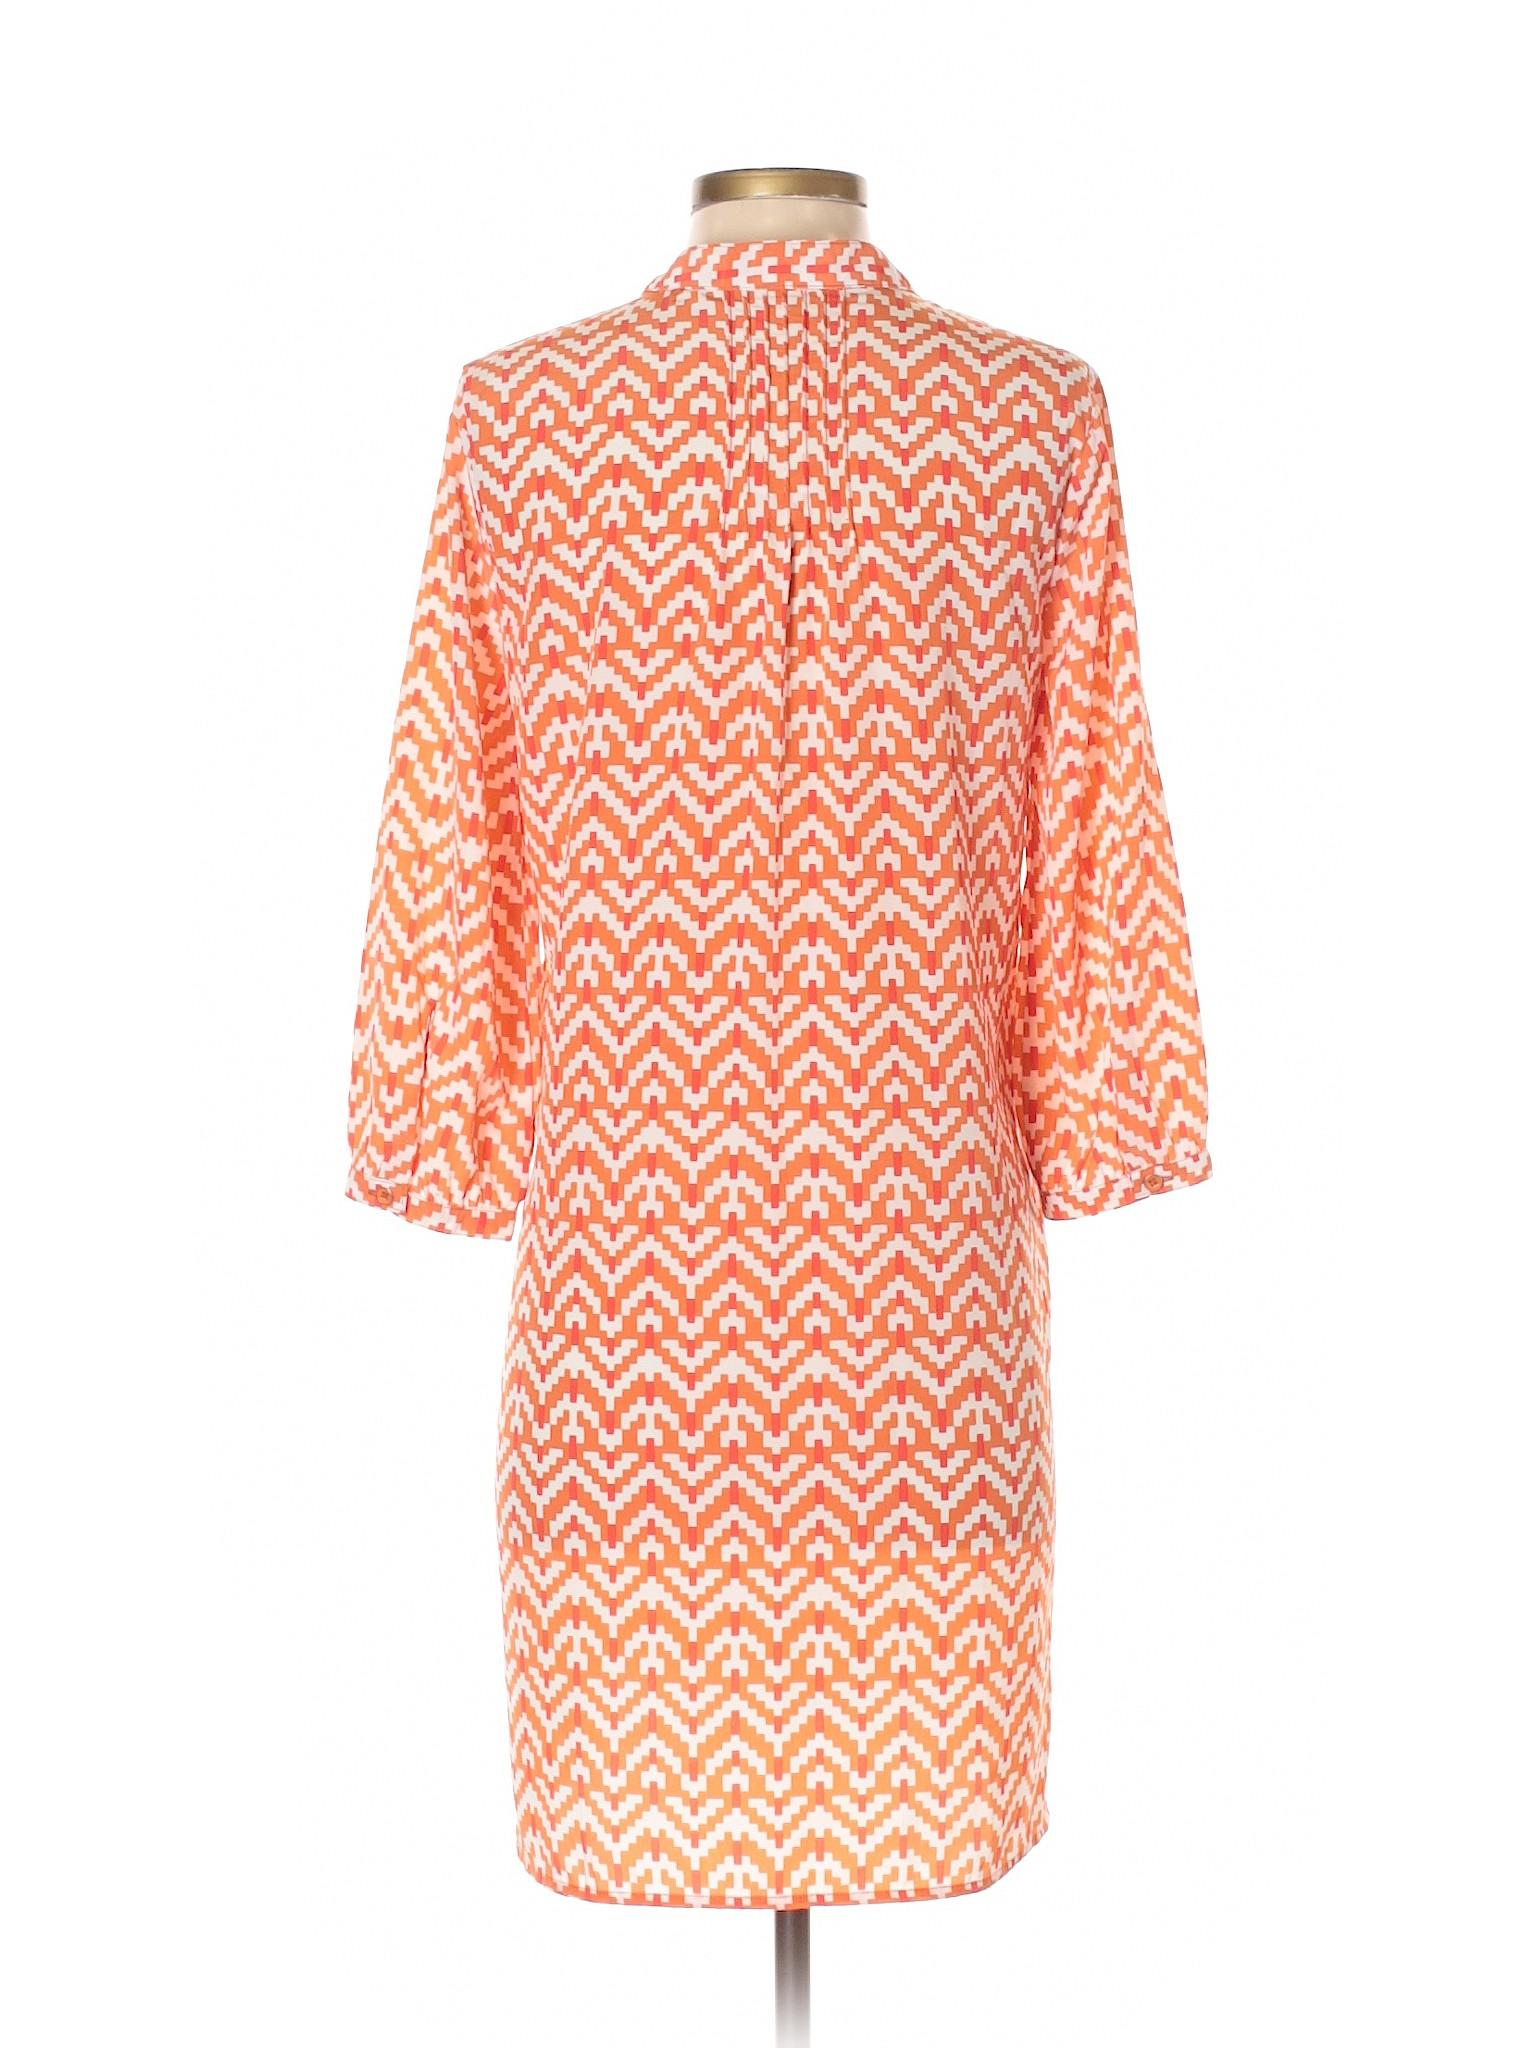 Gap Boutique winter winter Casual Gap Casual Dress Dress Boutique qTBZOS